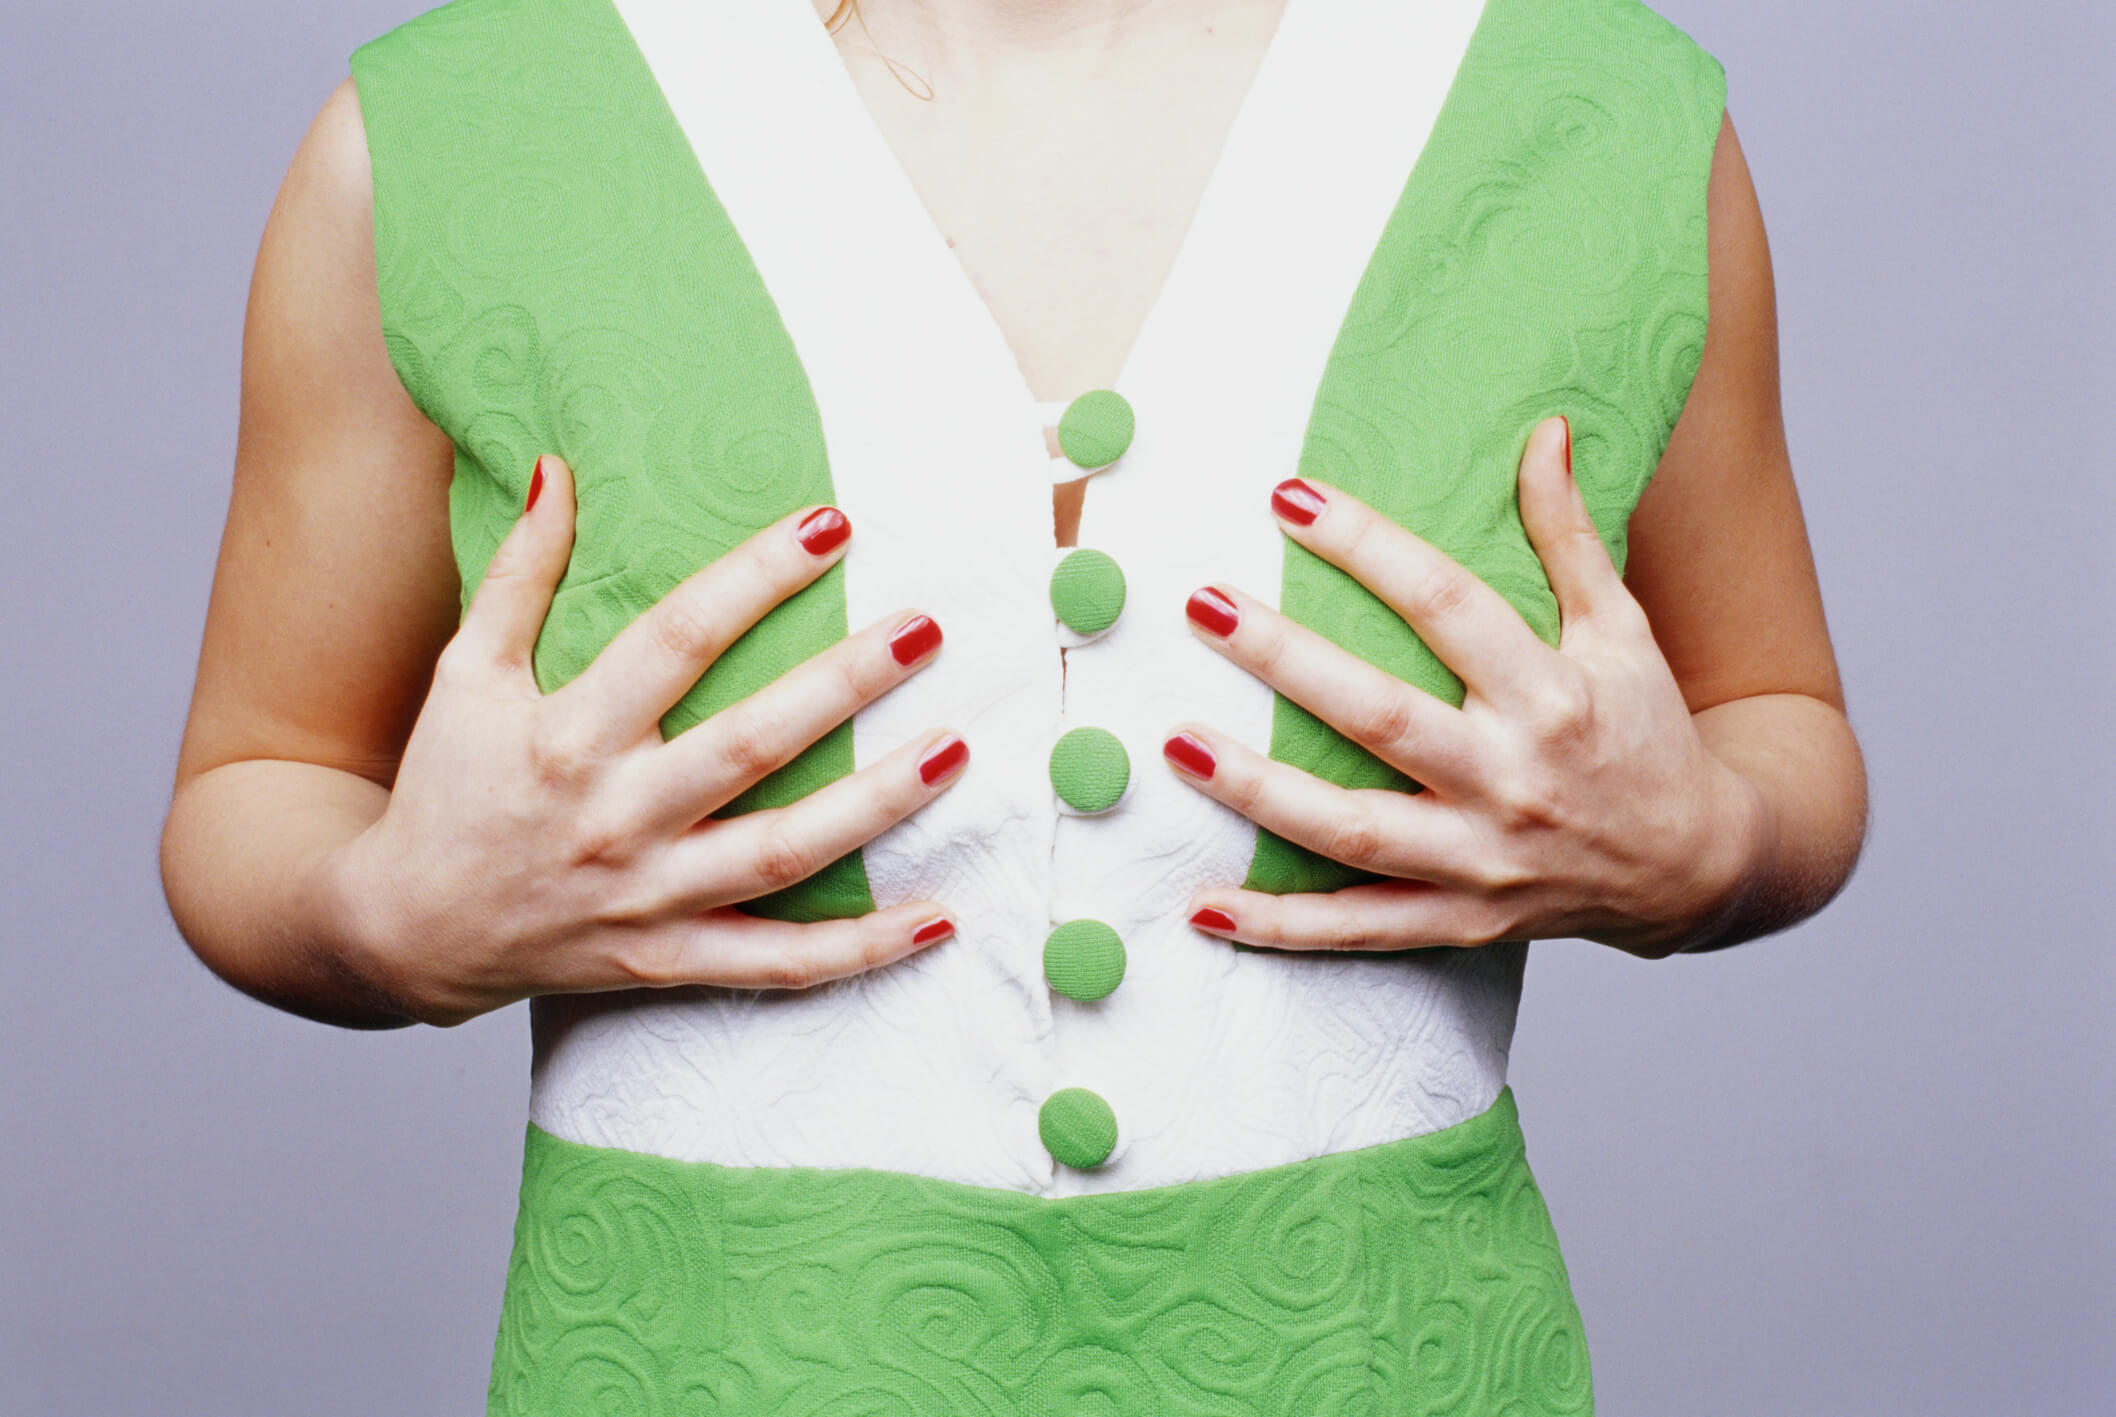 Wardrobe ⚡ famous malfunctions celebrity Celebrity Bikini